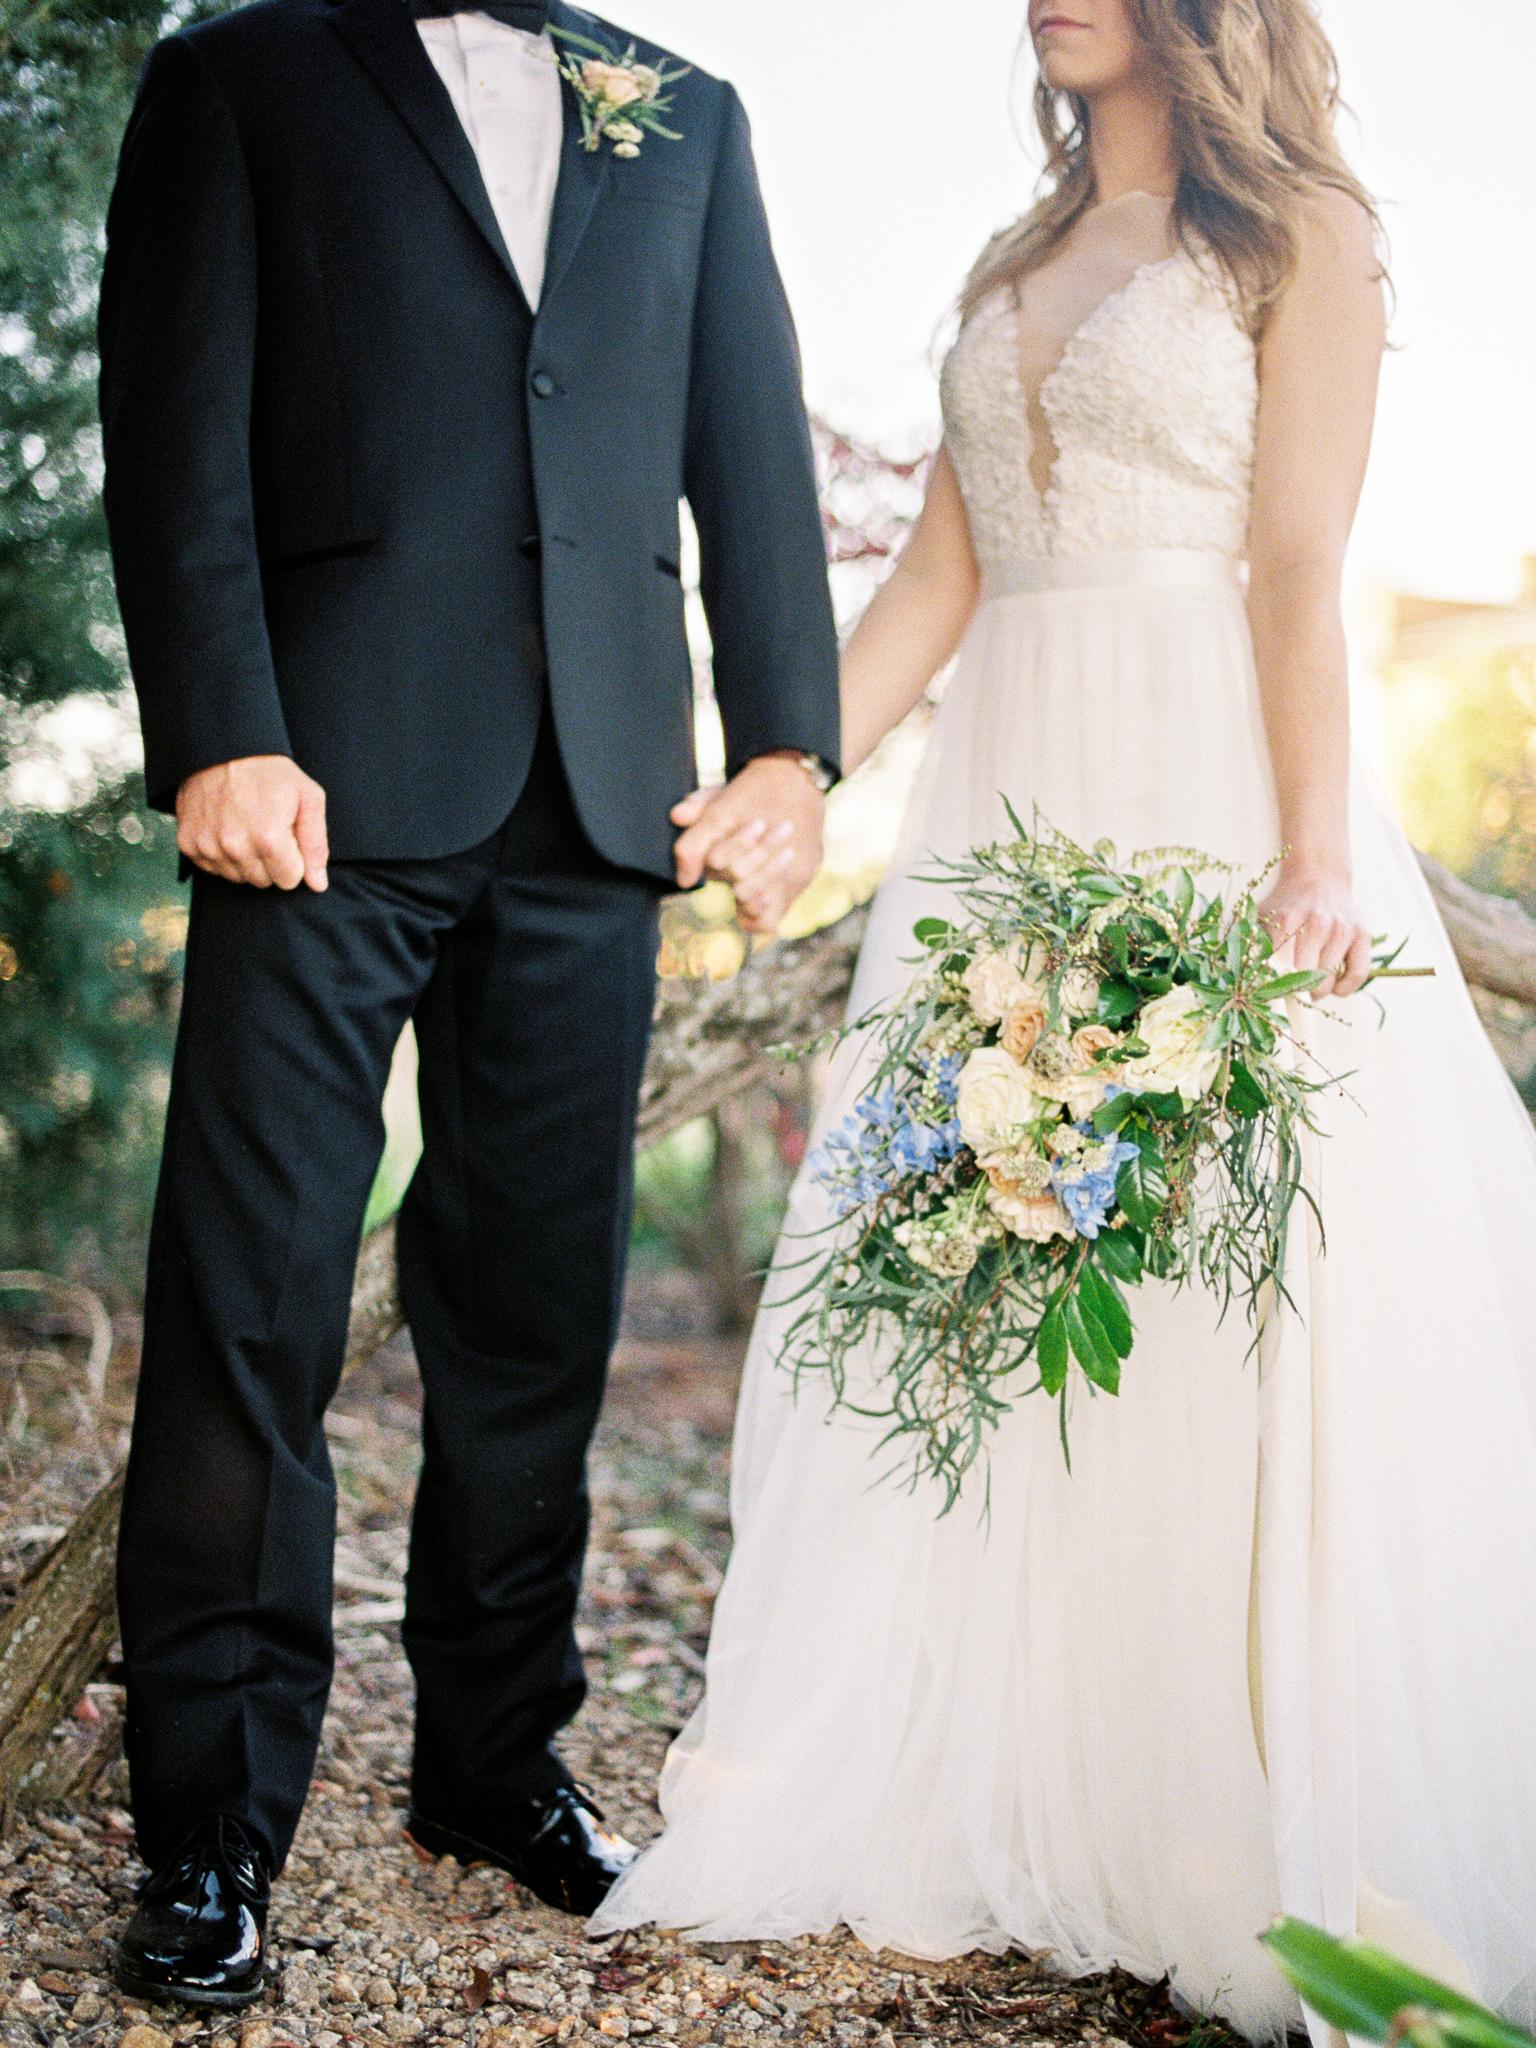 christinadavis+weddinginspiration33.jpg